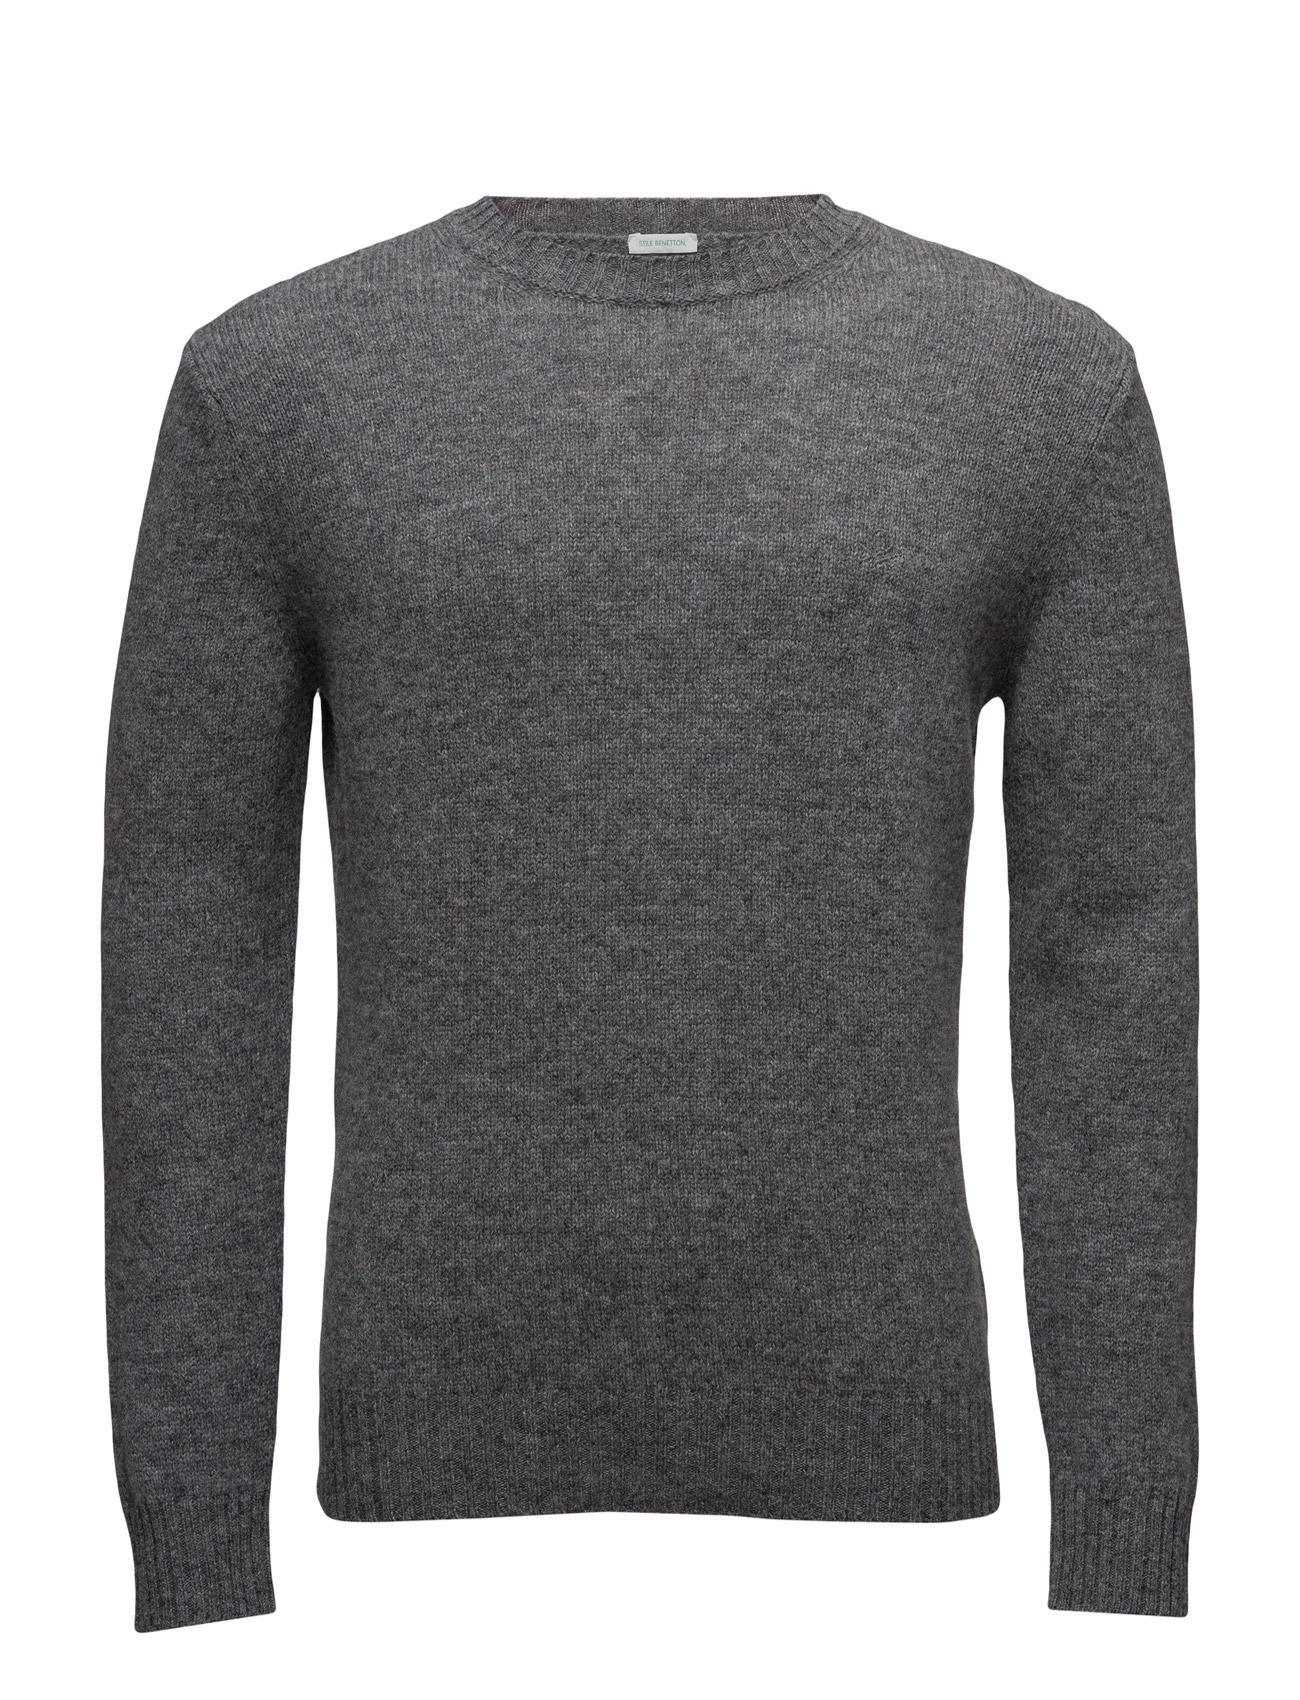 Sweater L/S United Colors of Benetton Rundhalsede til Herrer i